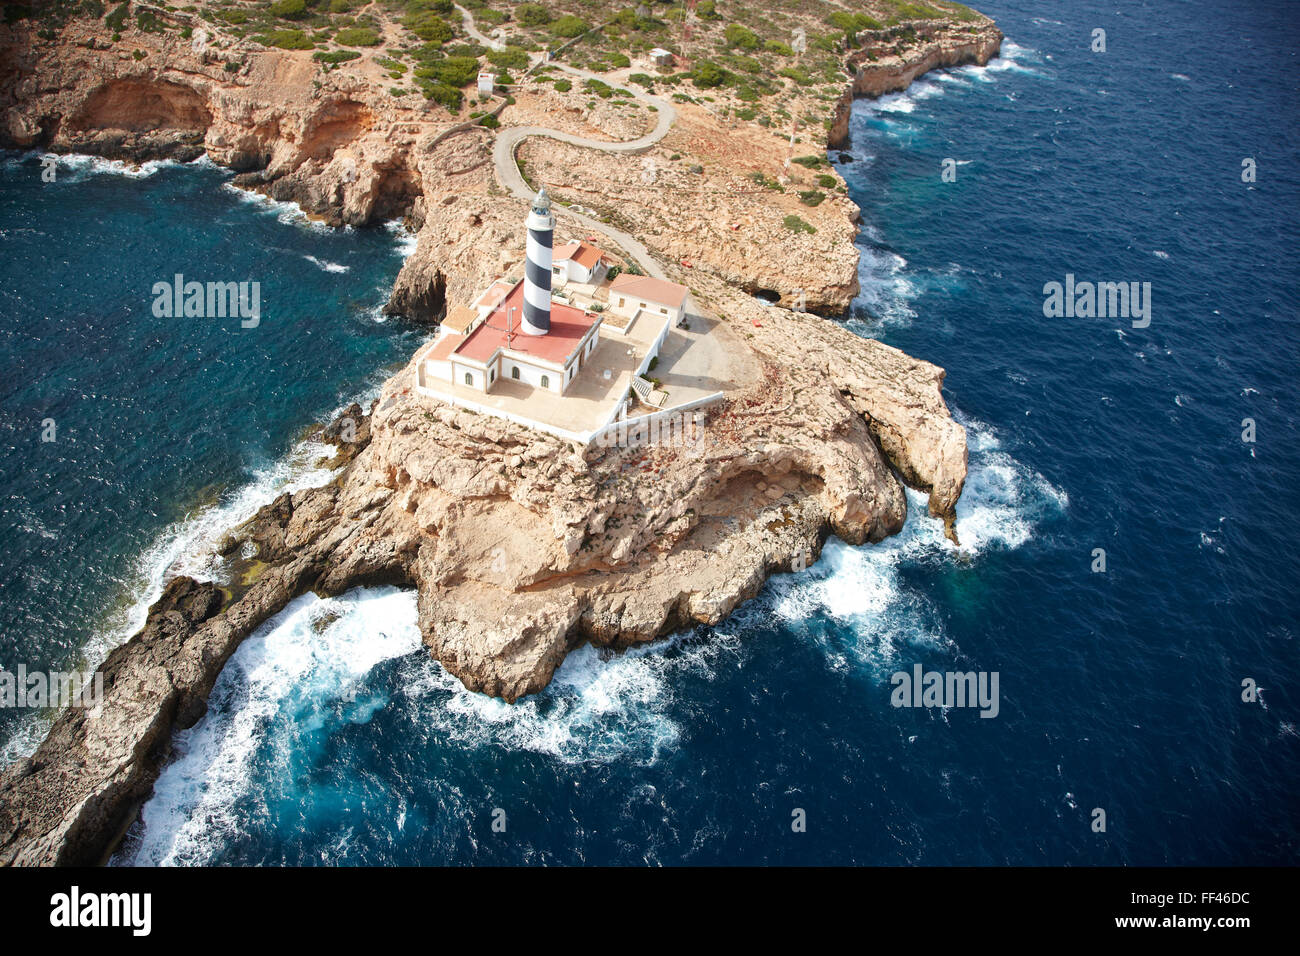 Aerial of the coastline of Mallorca - Stock Image